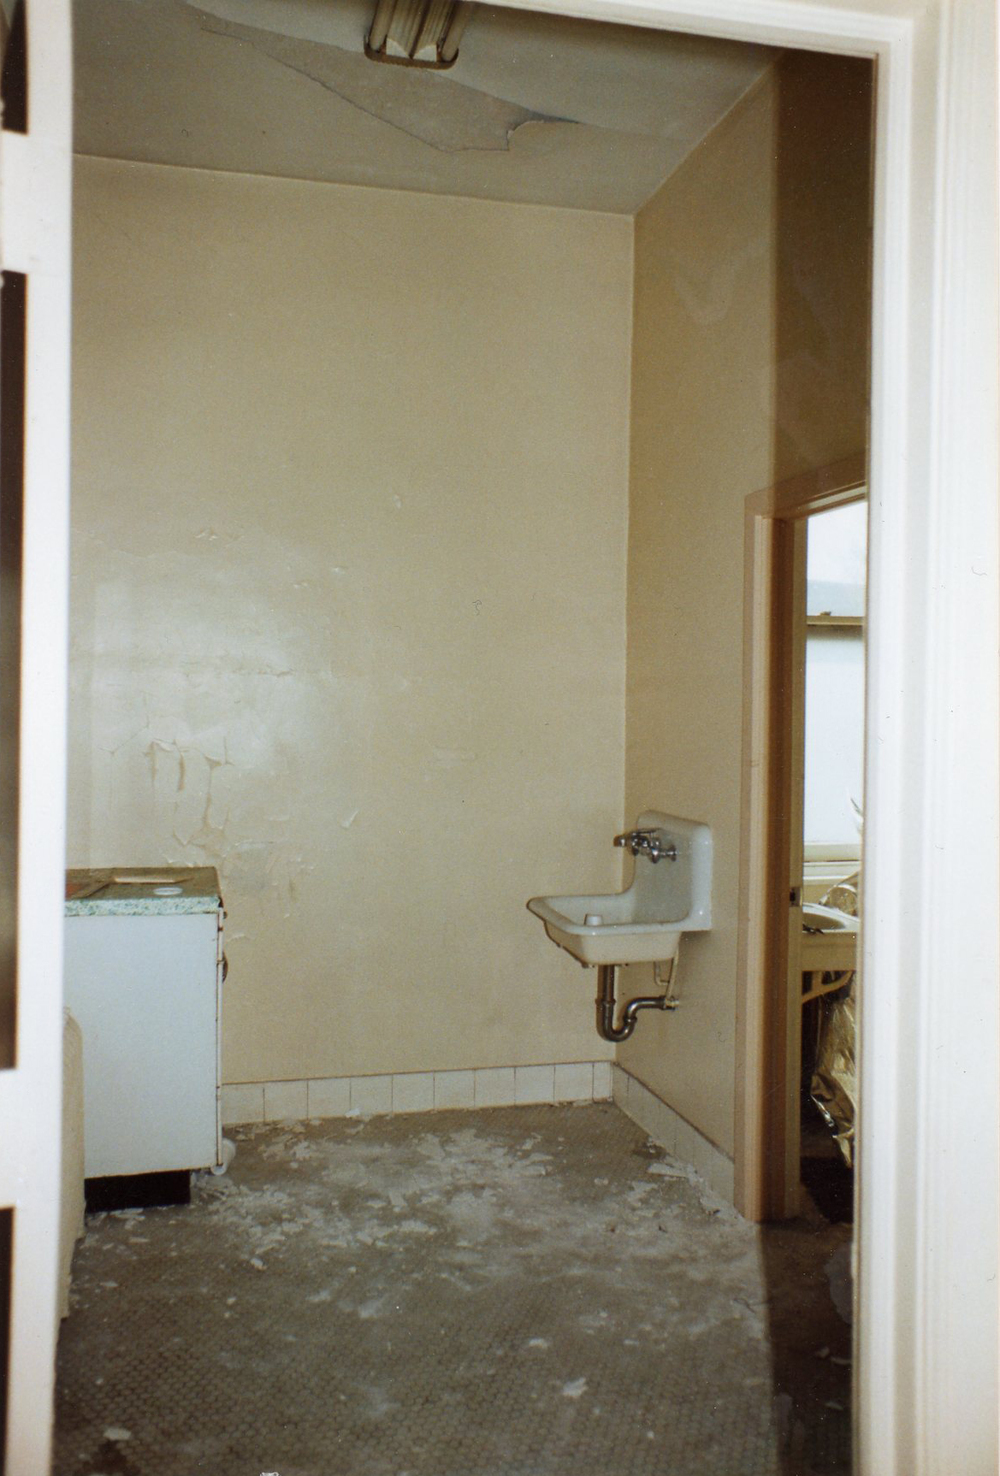 2ndfloor+bath+B4.jpg